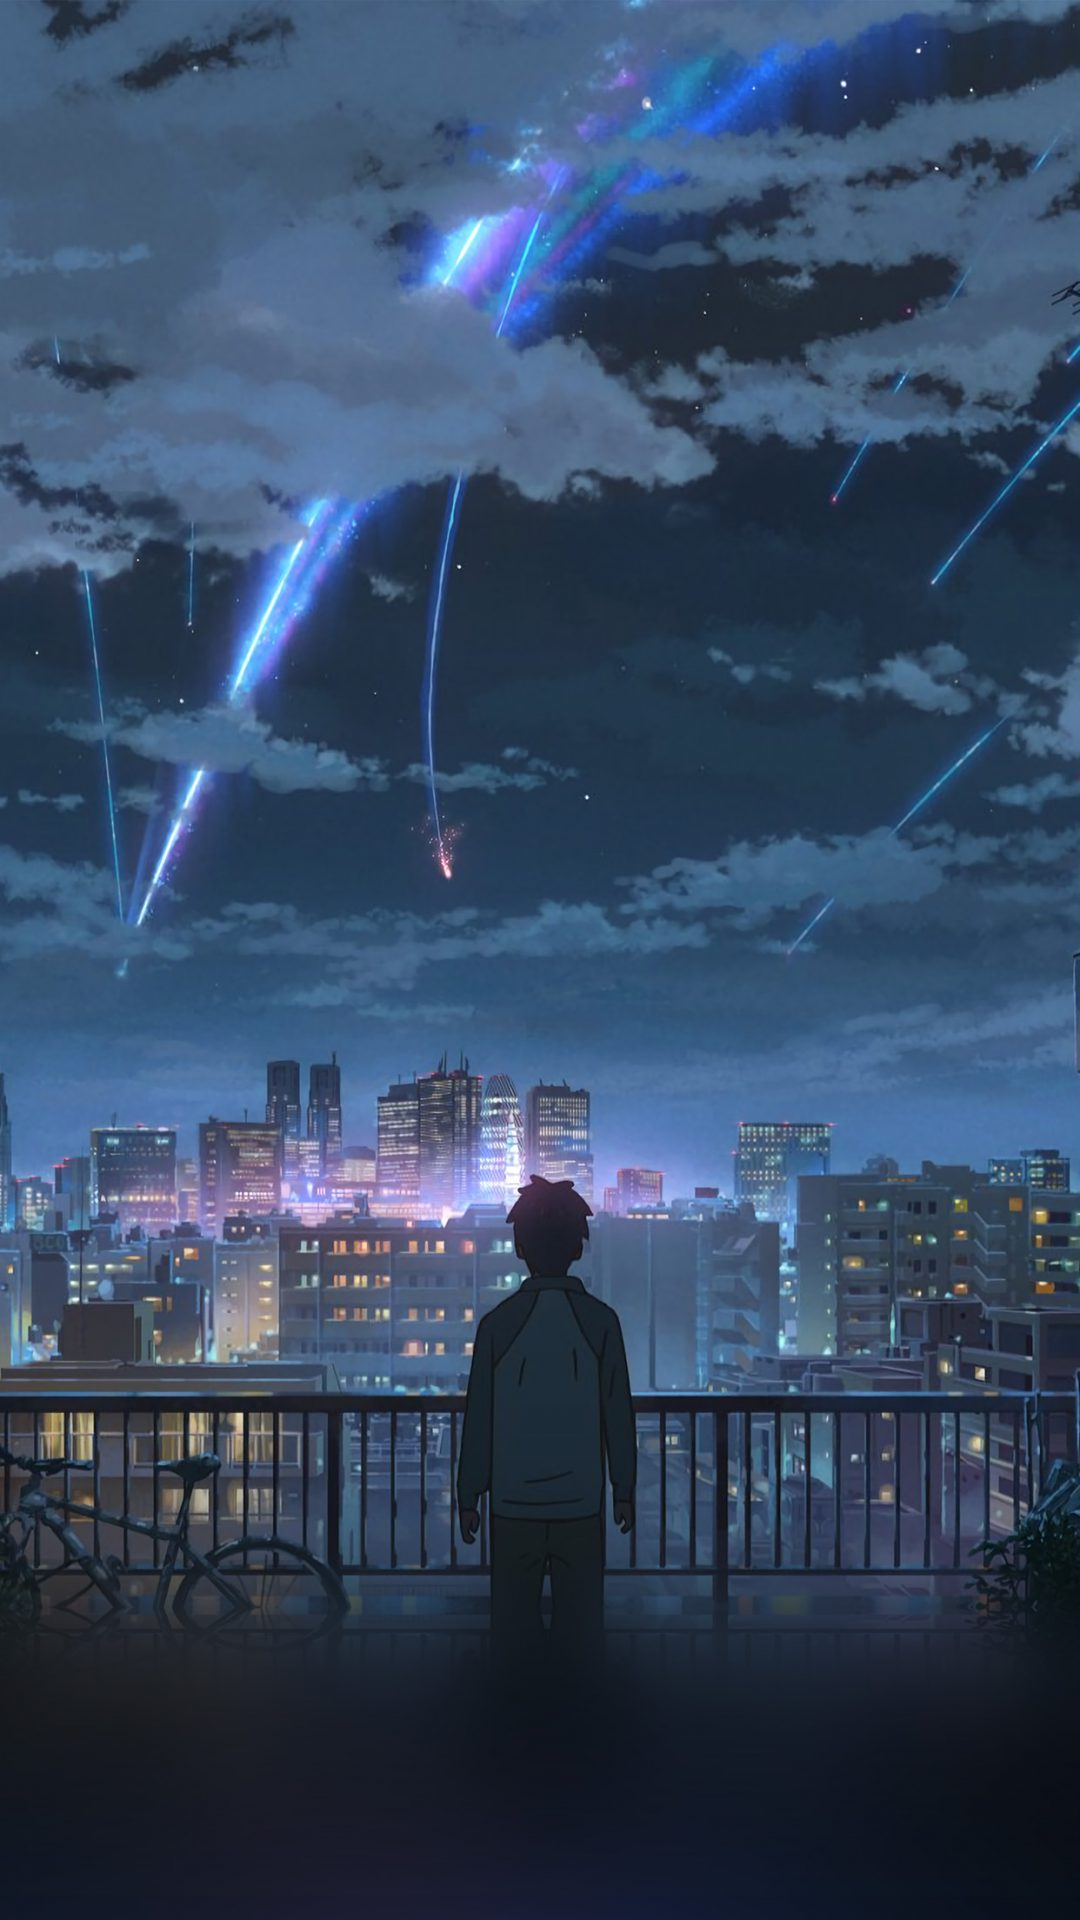 Yourname Night Anime Sky Illustration Art